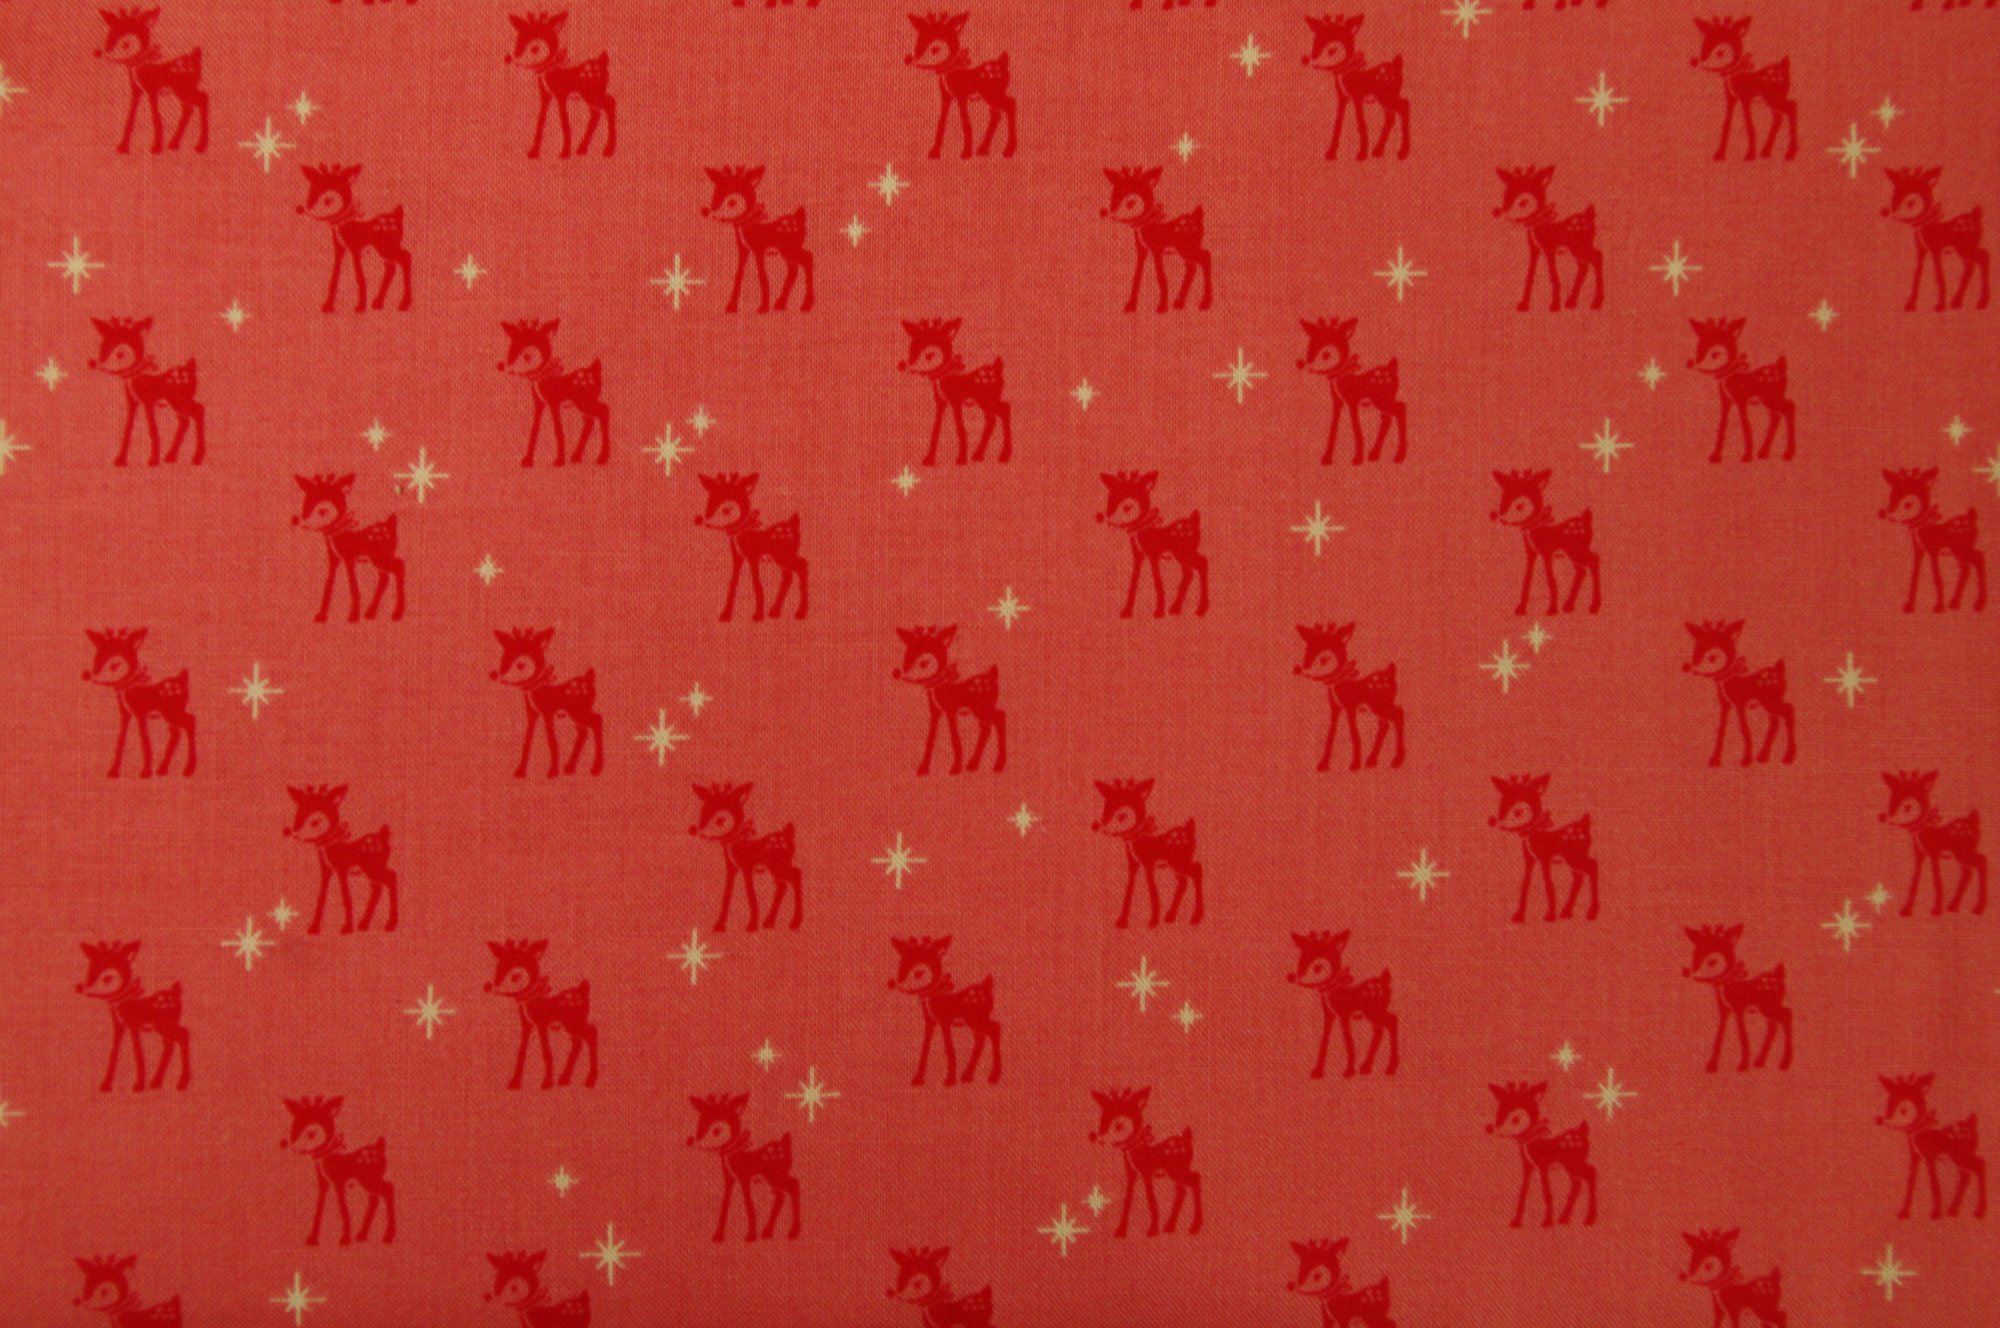 International Textiles - Cozy Christmas - Reindeer